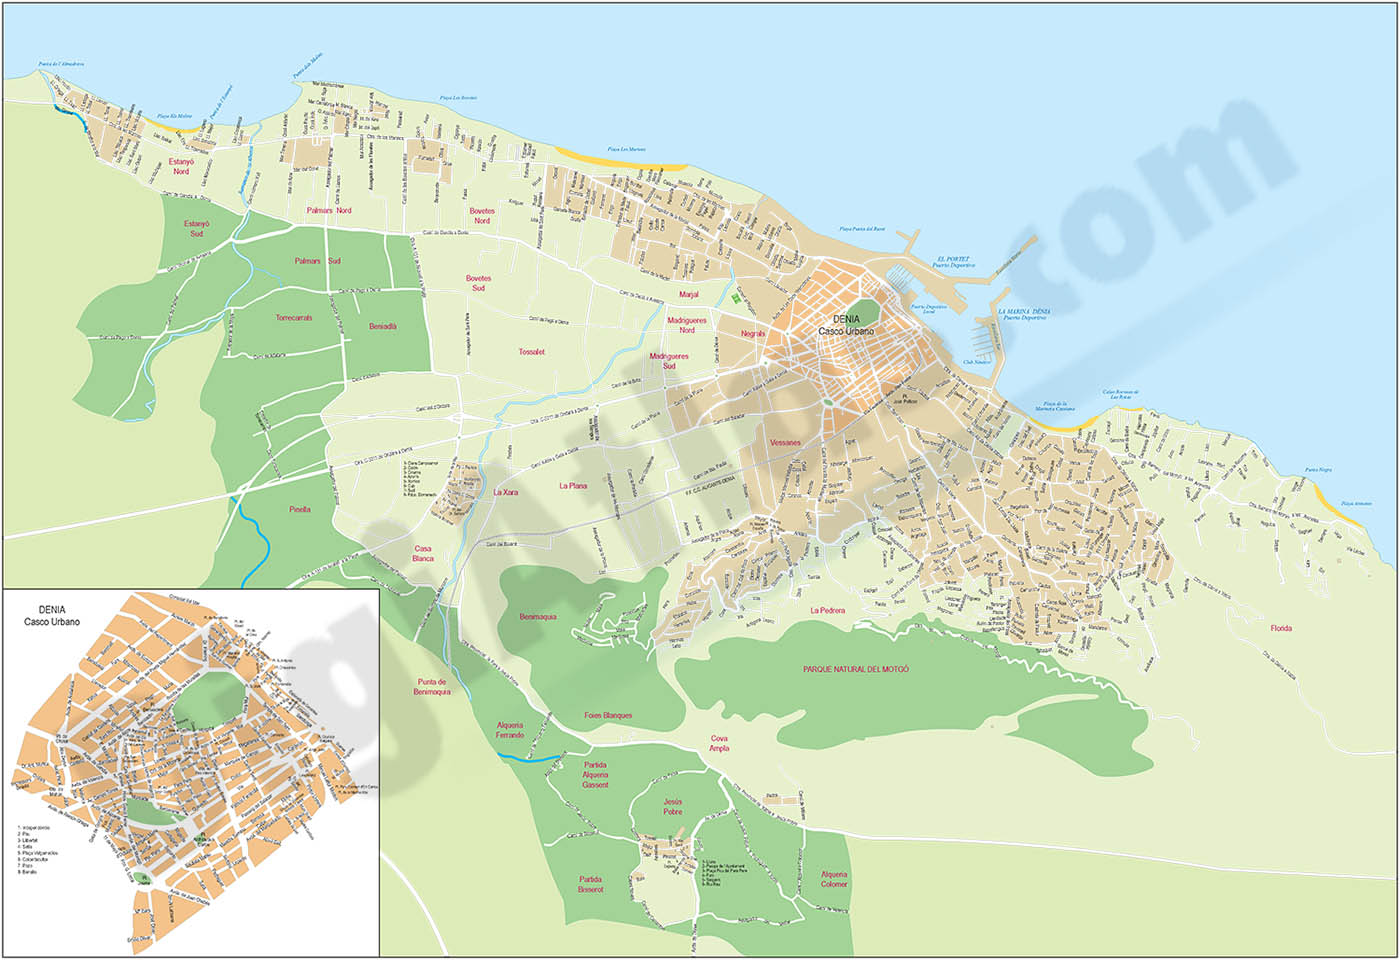 Denia (province of Alicante) - city map